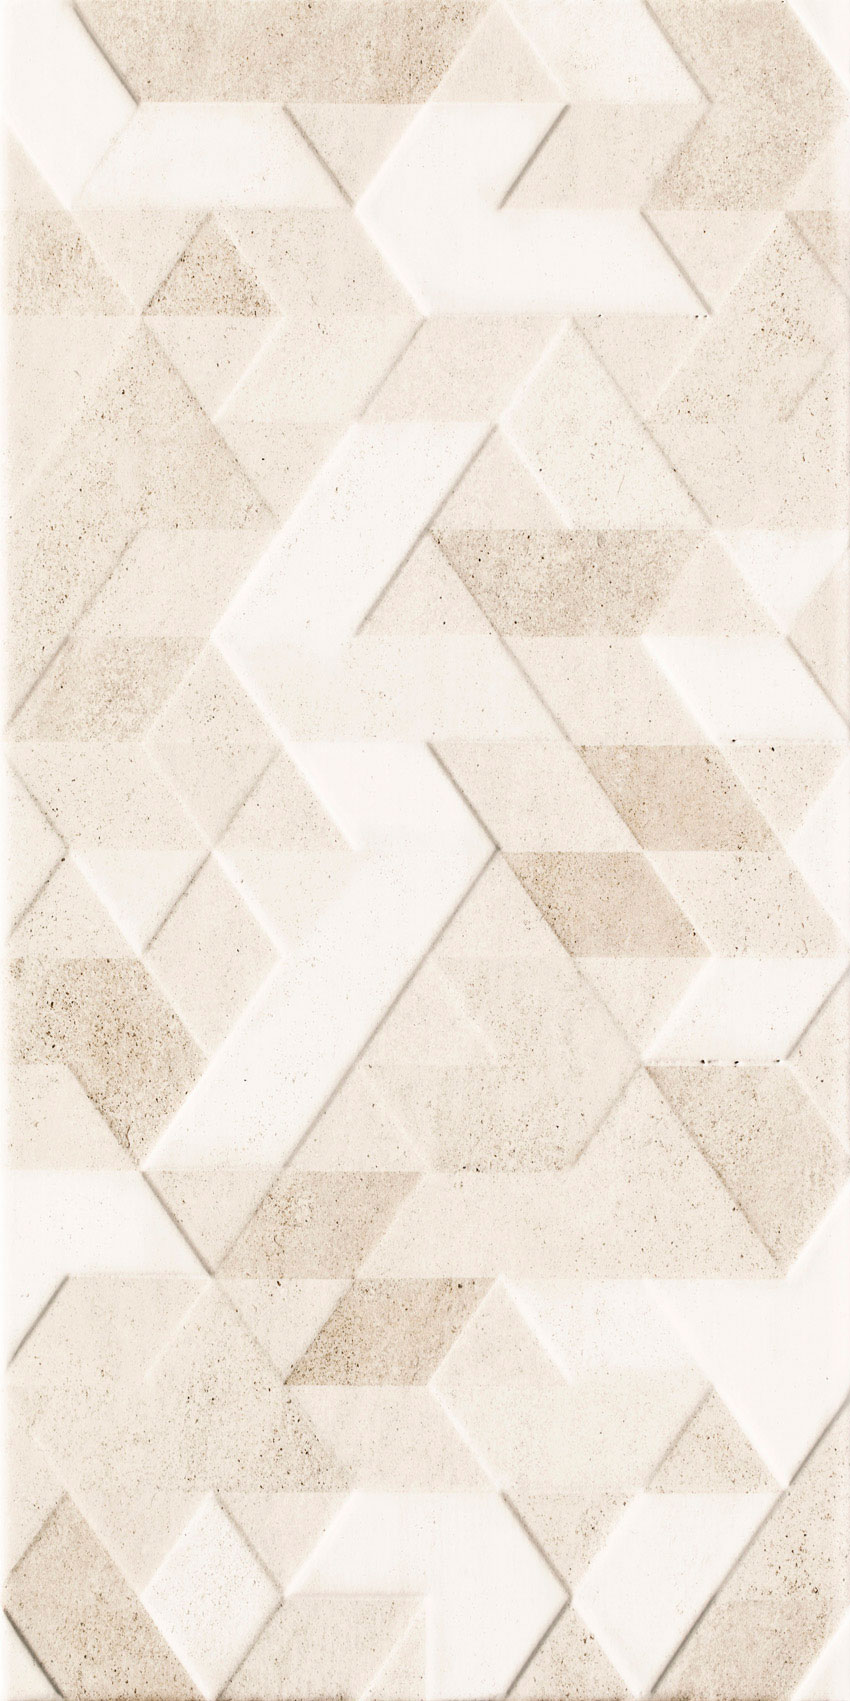 Настенная плитка Ceramika Paradyz Emilly Beige struktura decor 30x60 (1,44) vitra ethereal brown l beige geometric lines decor mix glossy 30x60